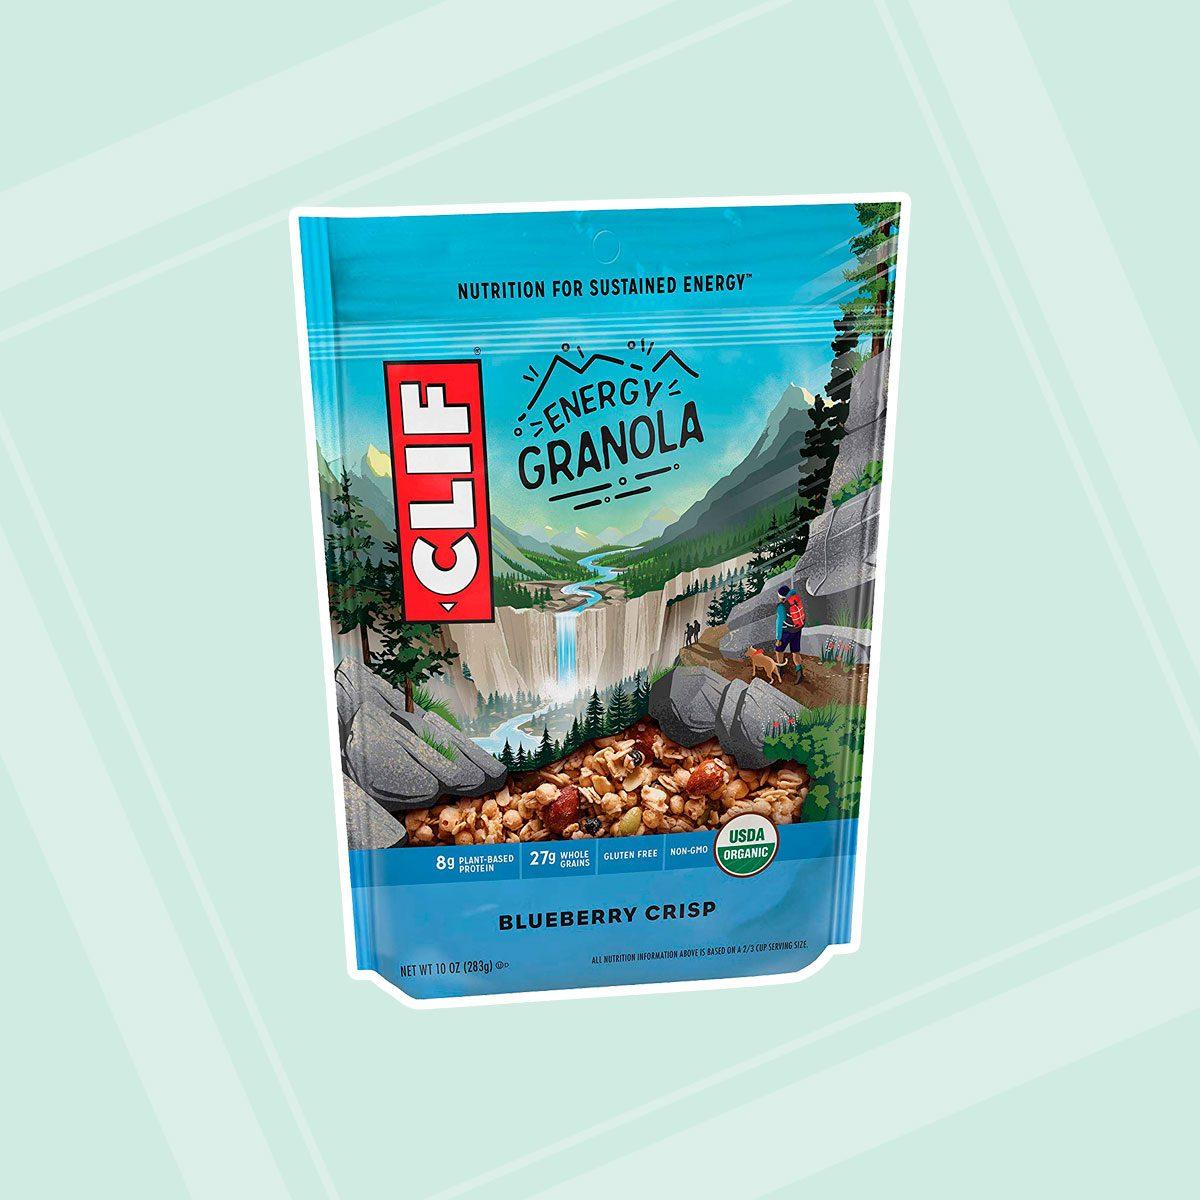 CLIF BAR Granola